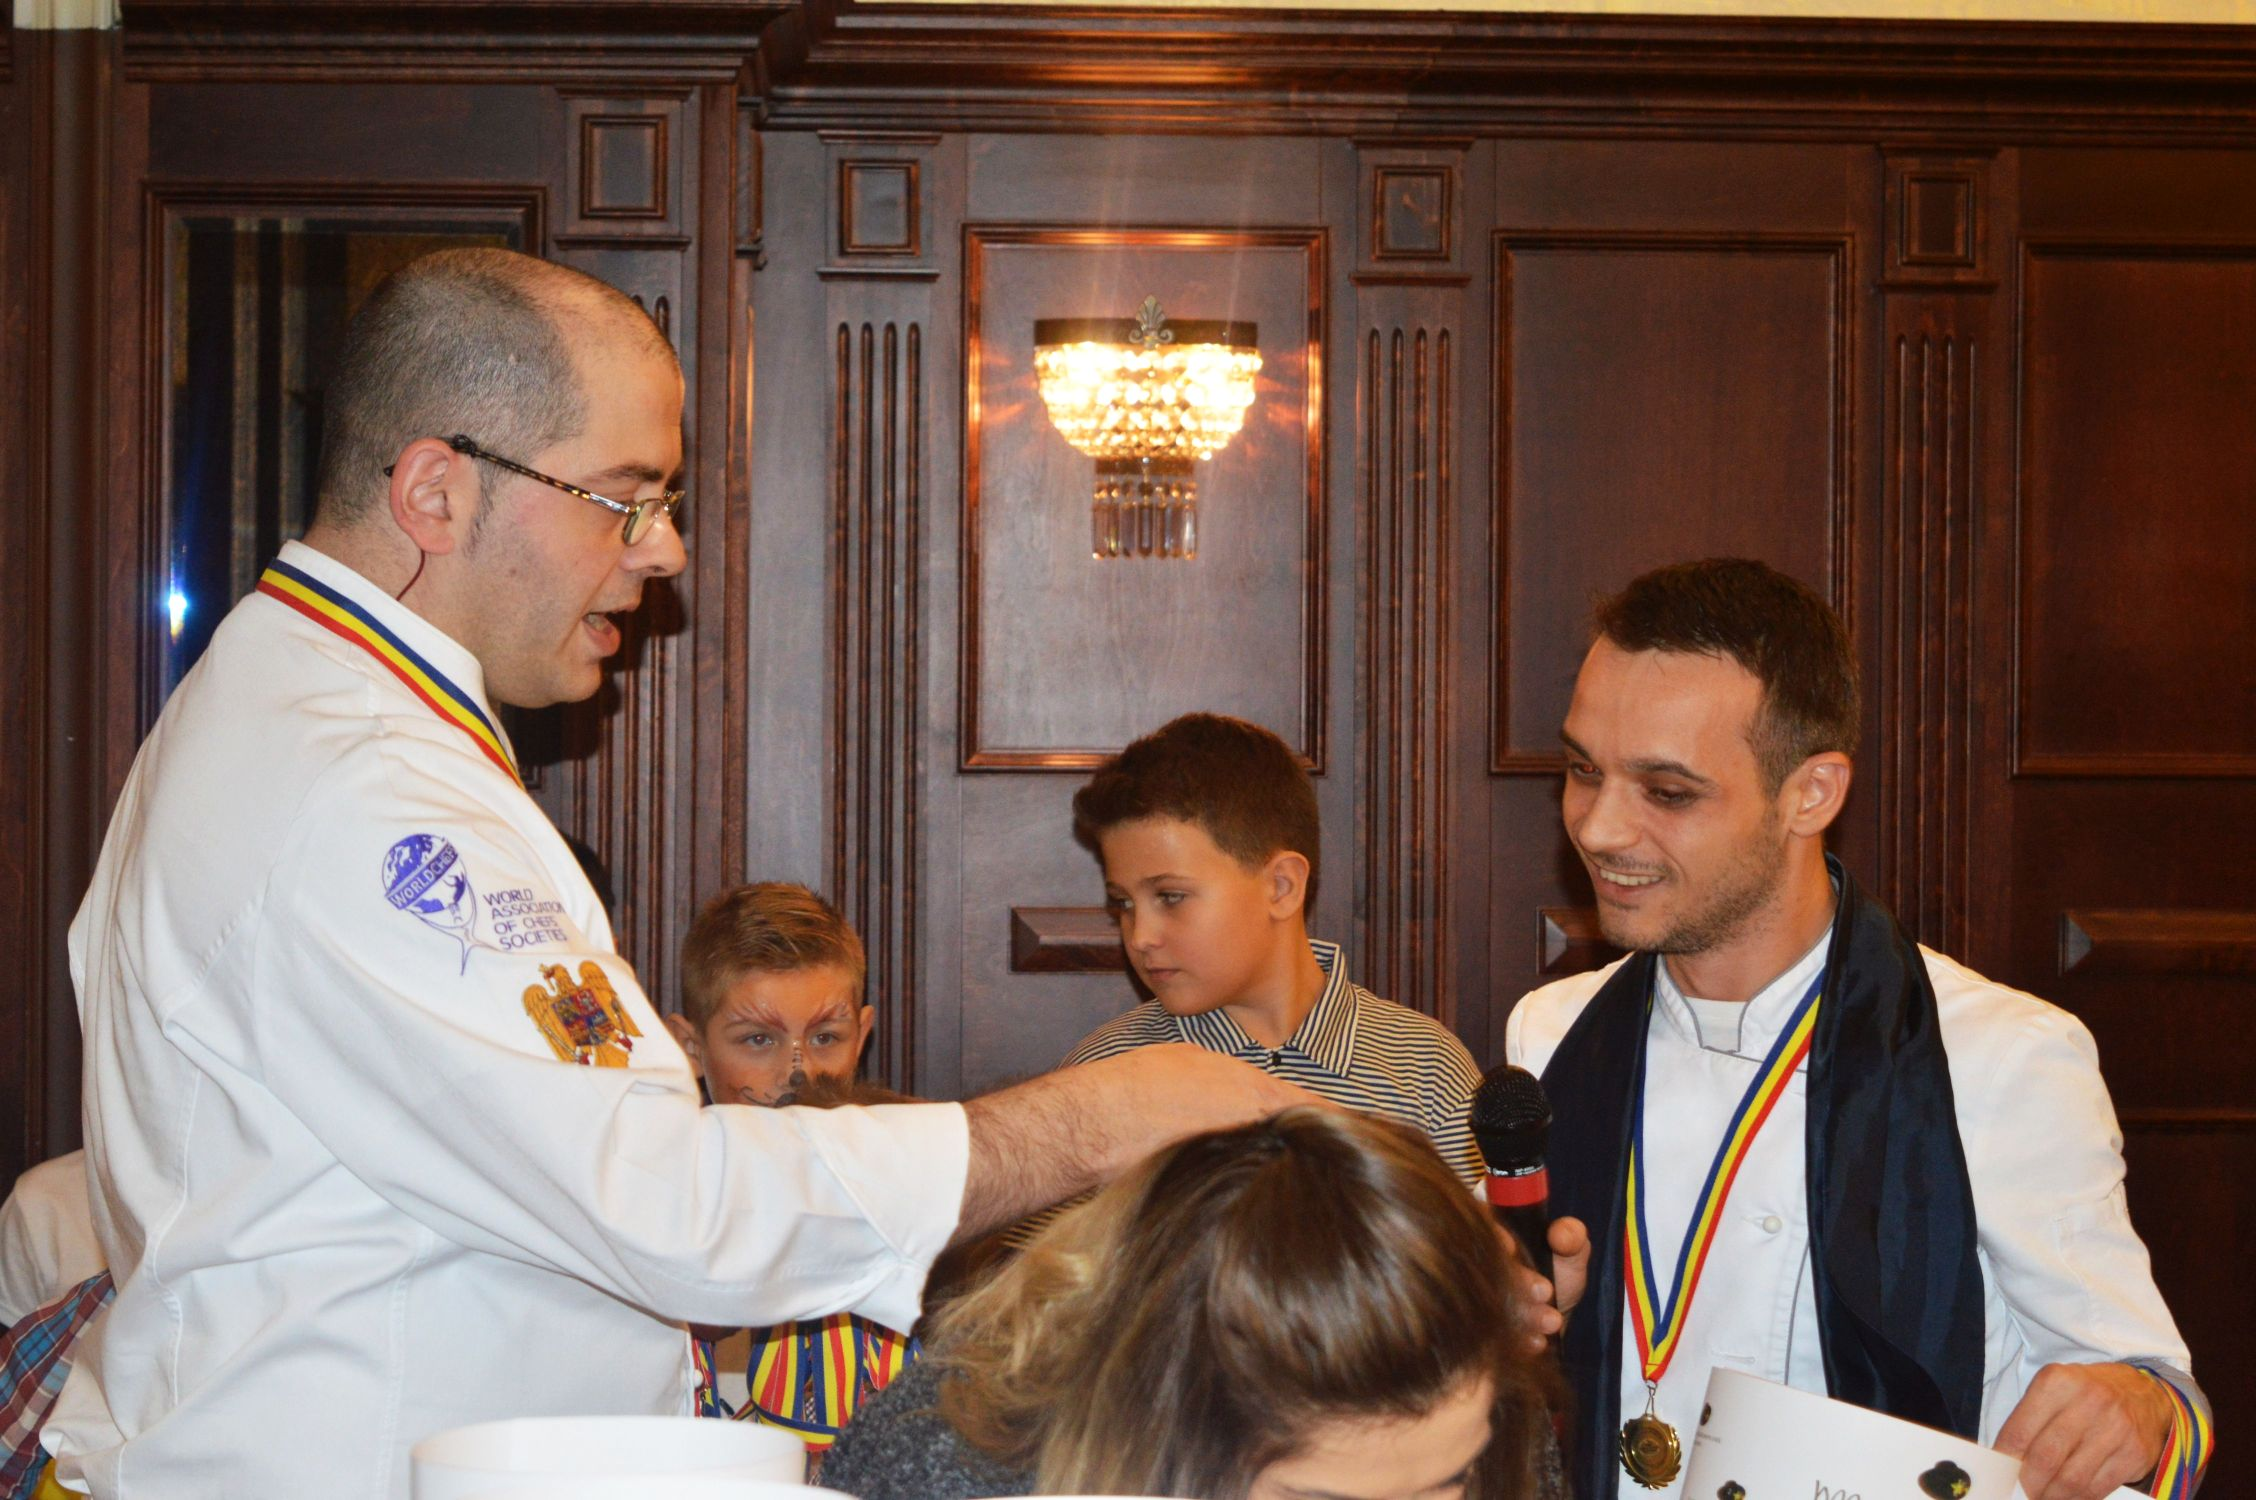 Sarbatoarea-Gustului-Lectia-Gustului-Ramada-Nord-Hotel-Alessandro Corradi-13